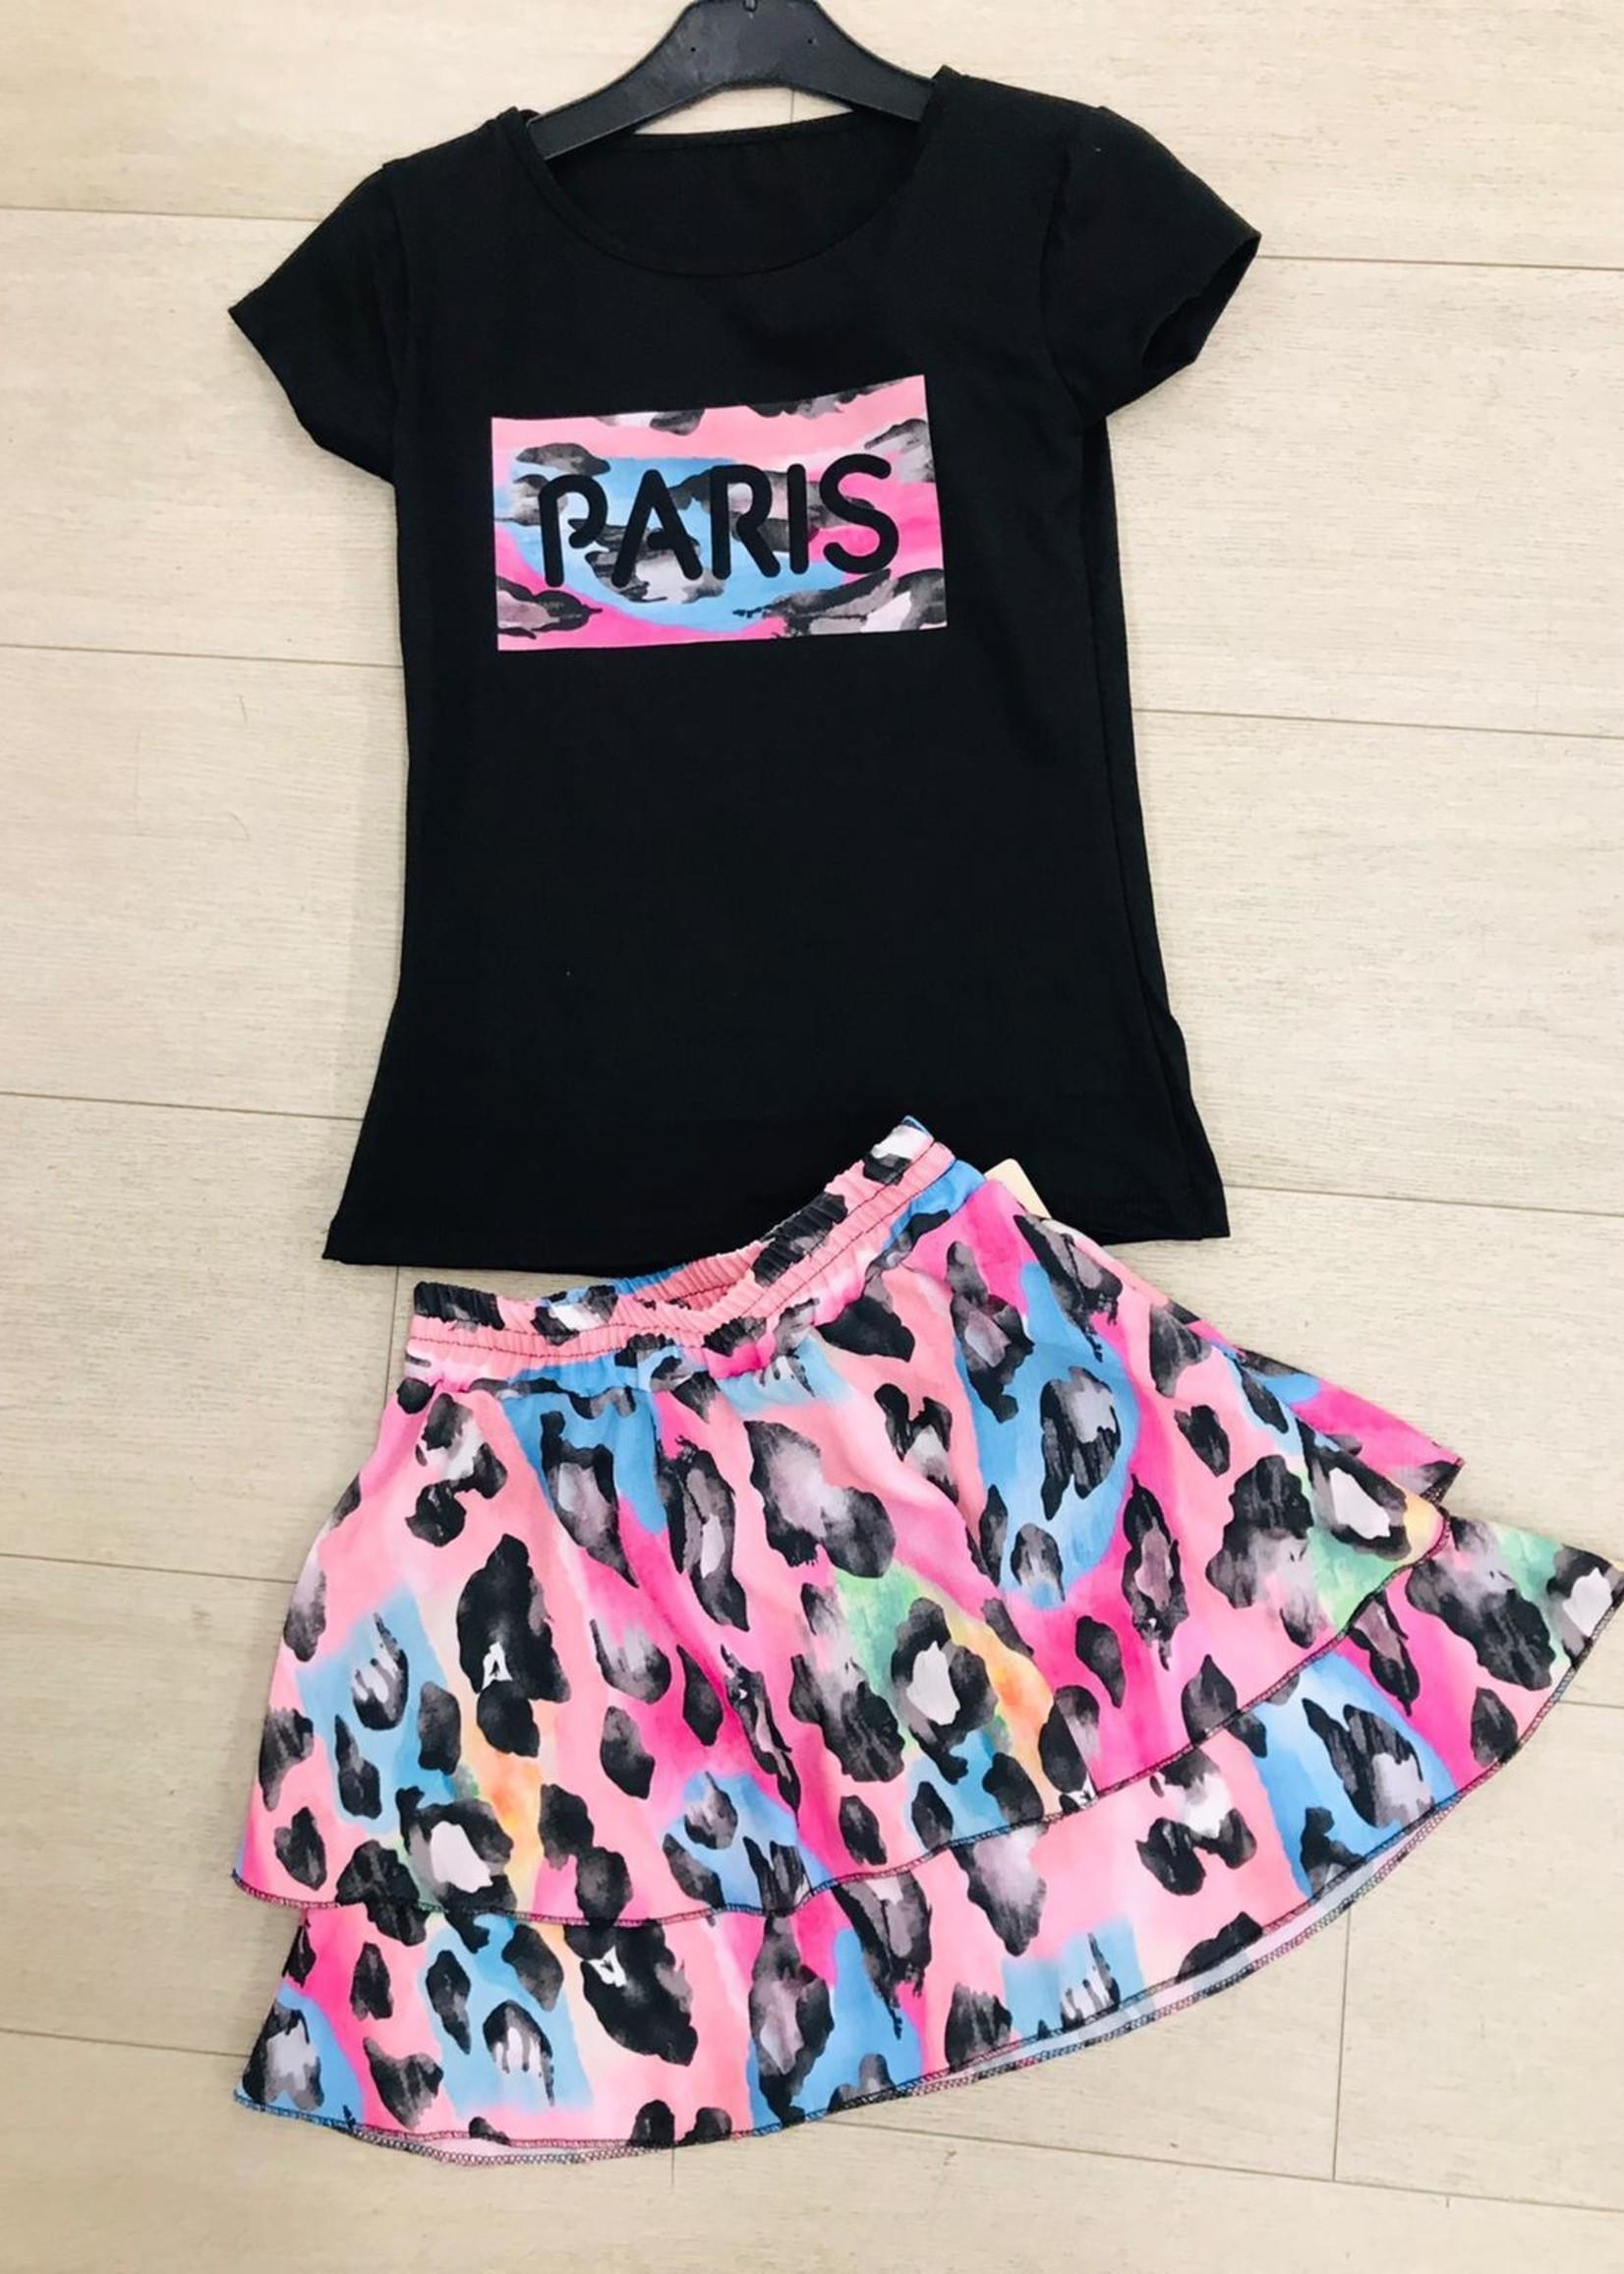 Divanis Divanis paris skirt set zwart roze